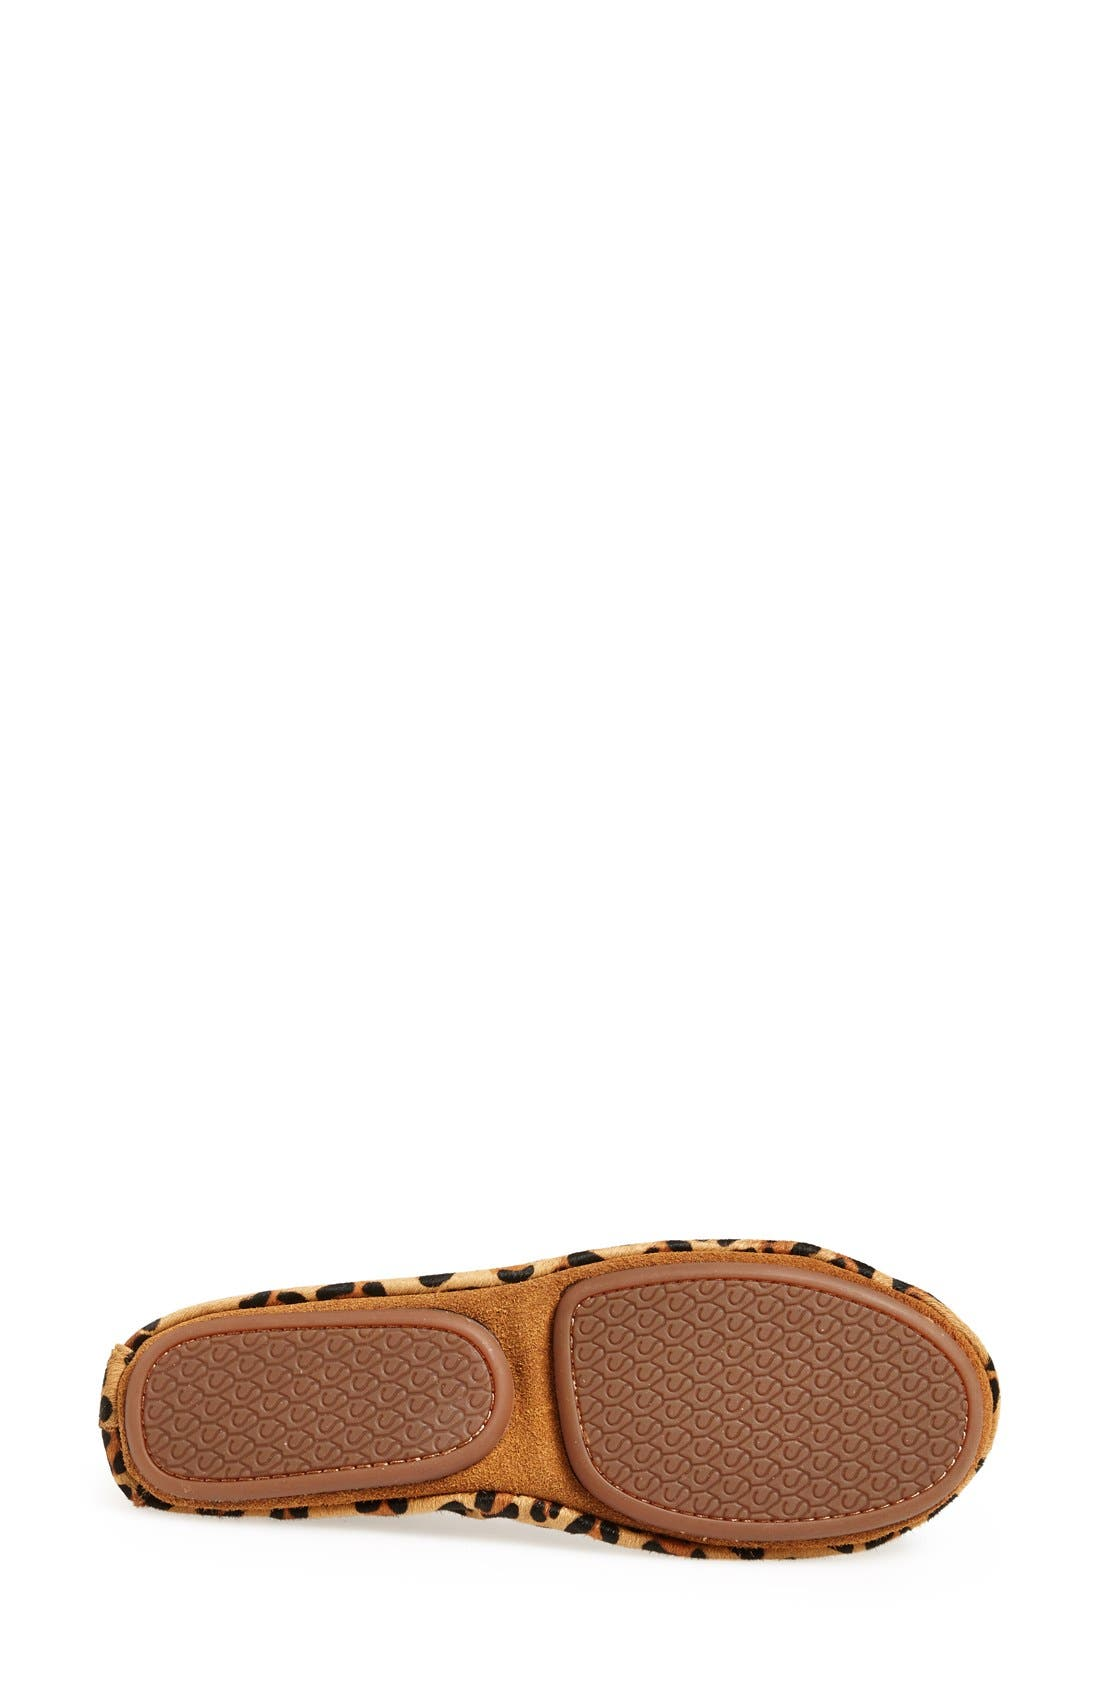 'Samara' Genuine Calf Hair Foldable Ballet Flat,                             Alternate thumbnail 4, color,                             Leopard